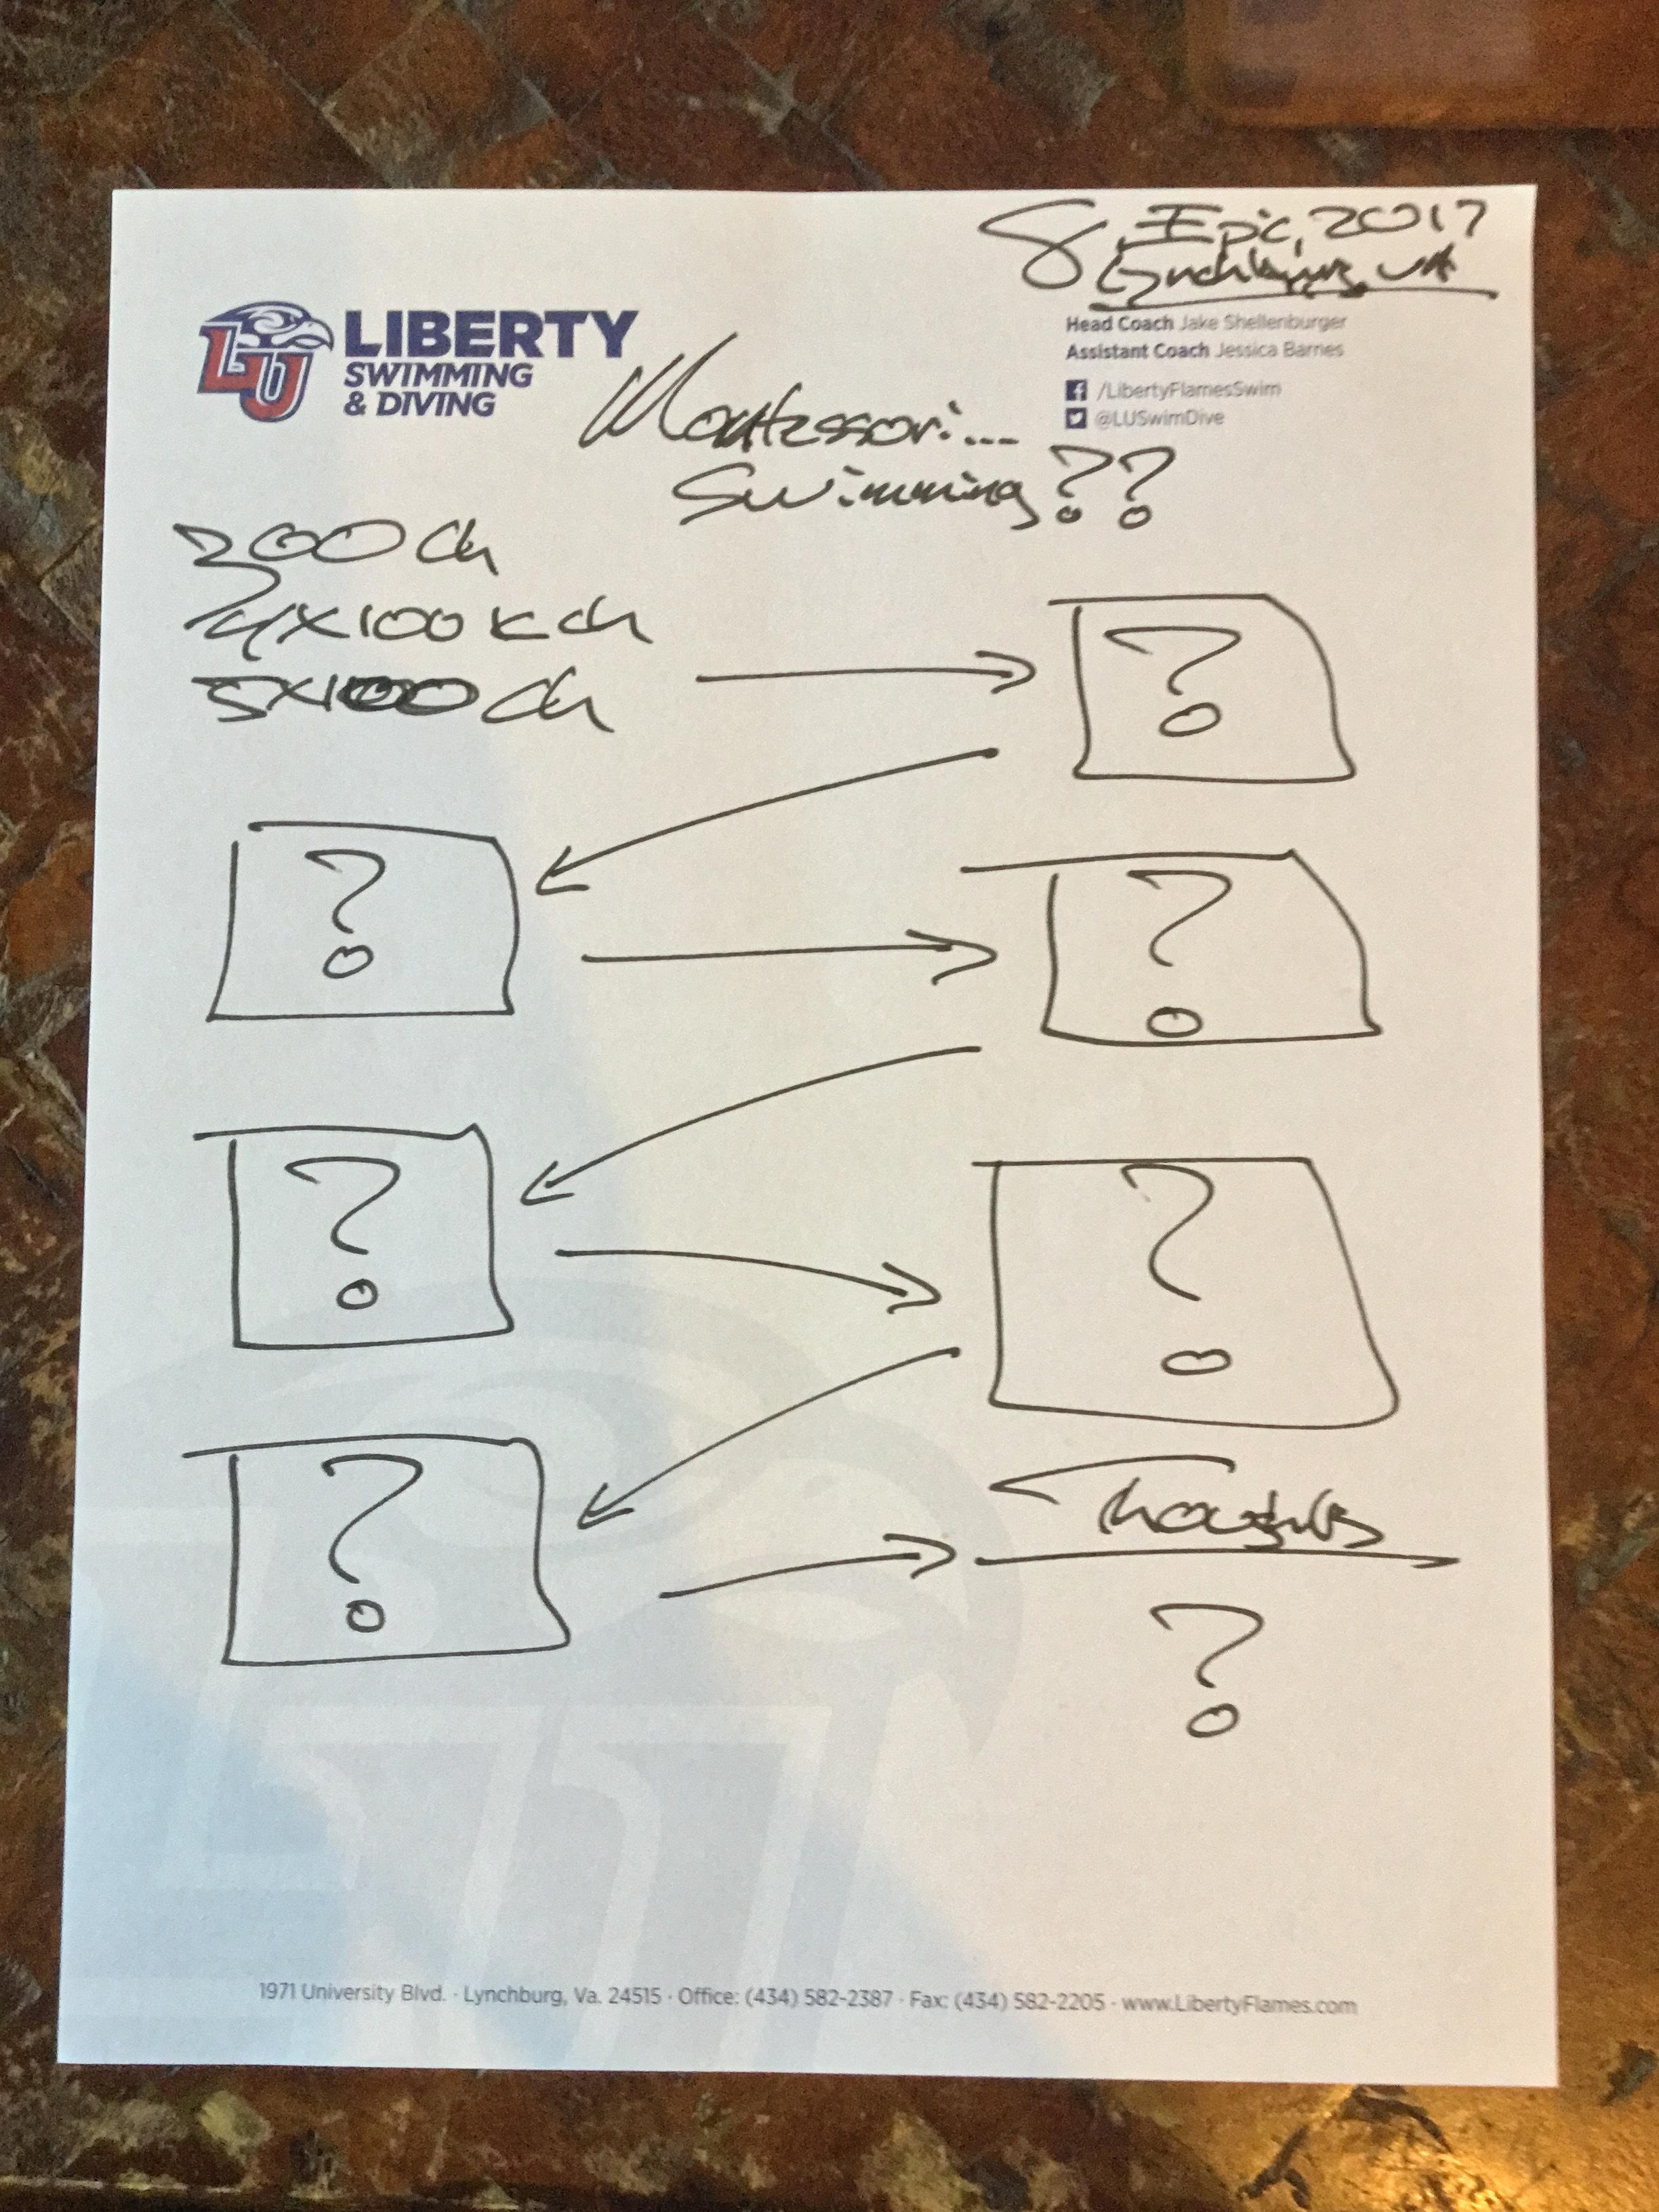 Liberty-university-swimming-sprint.JPG